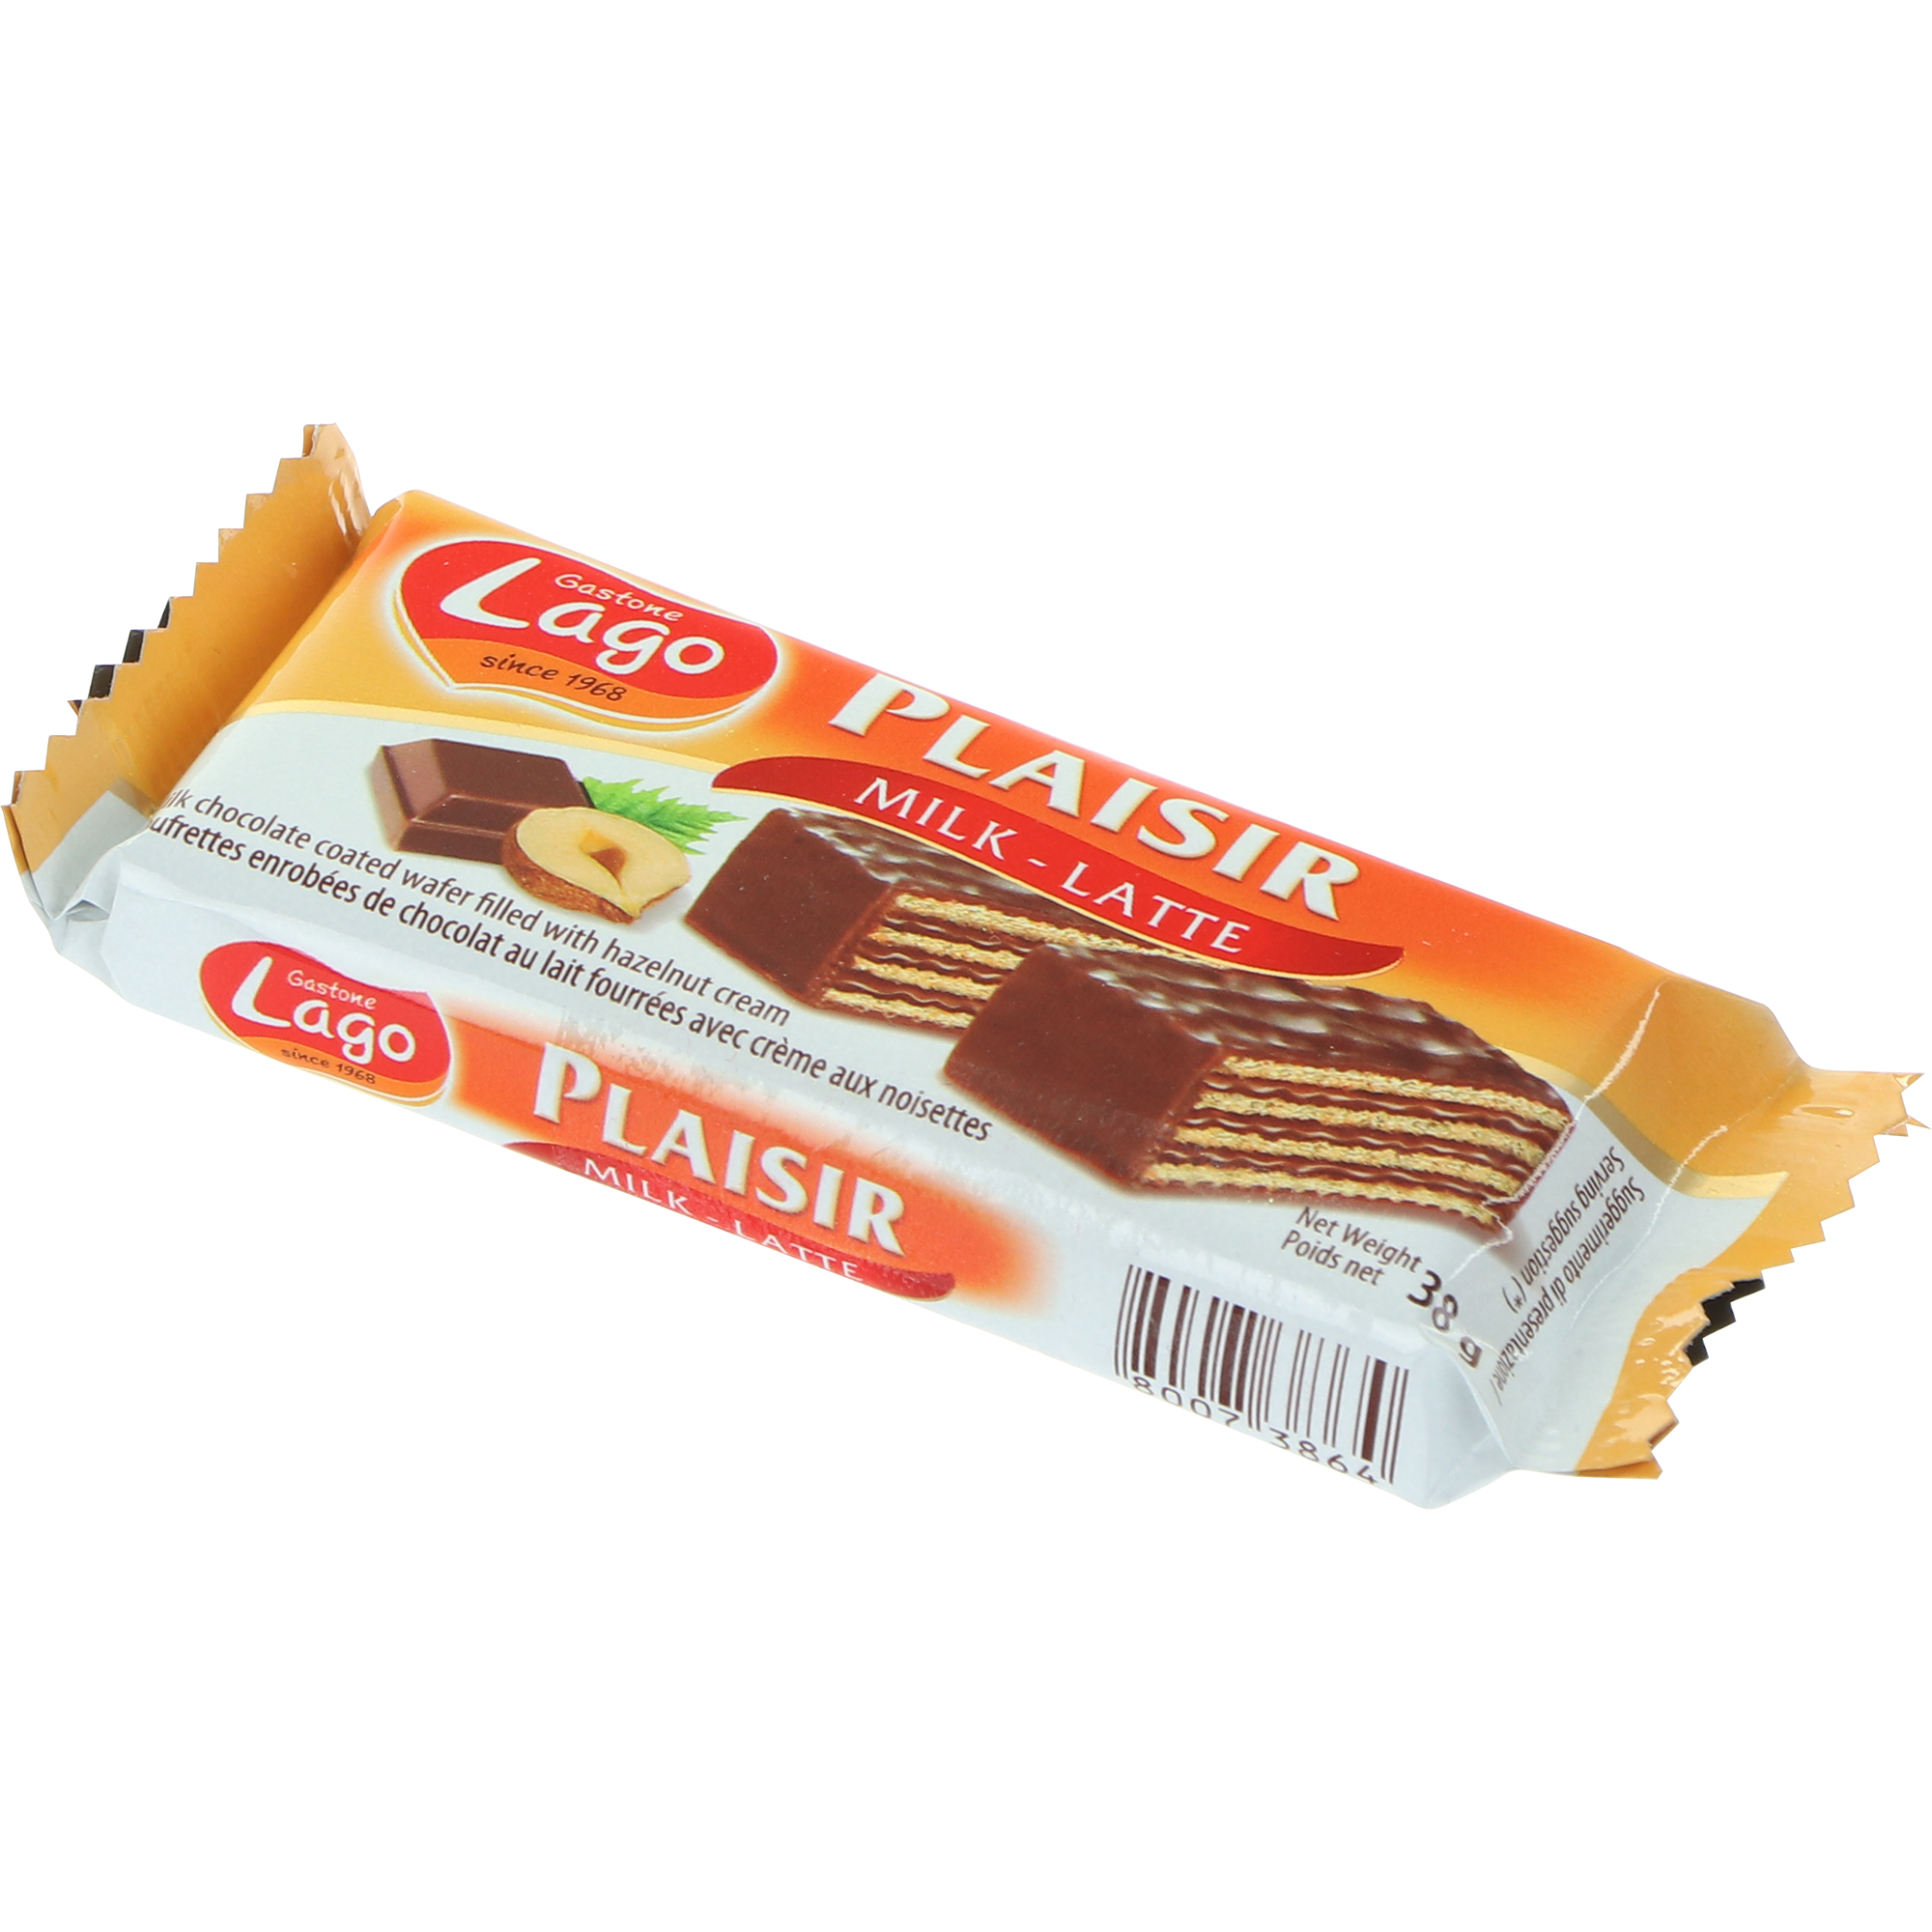 Вафли Gastone Lago Plaisir молочный шоколад, 38 г недорого